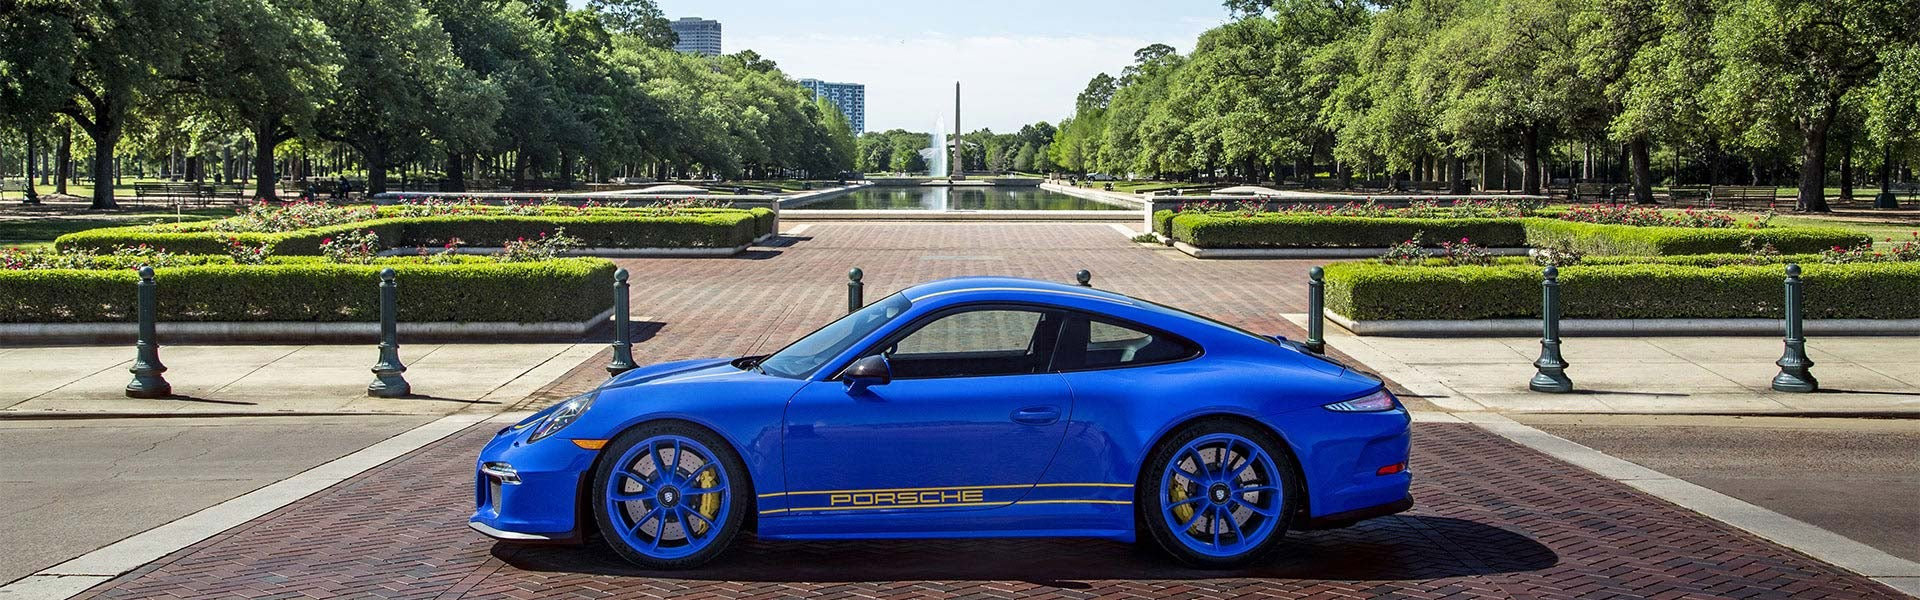 Porsche North Houston | New and Used Porsche Dealership in